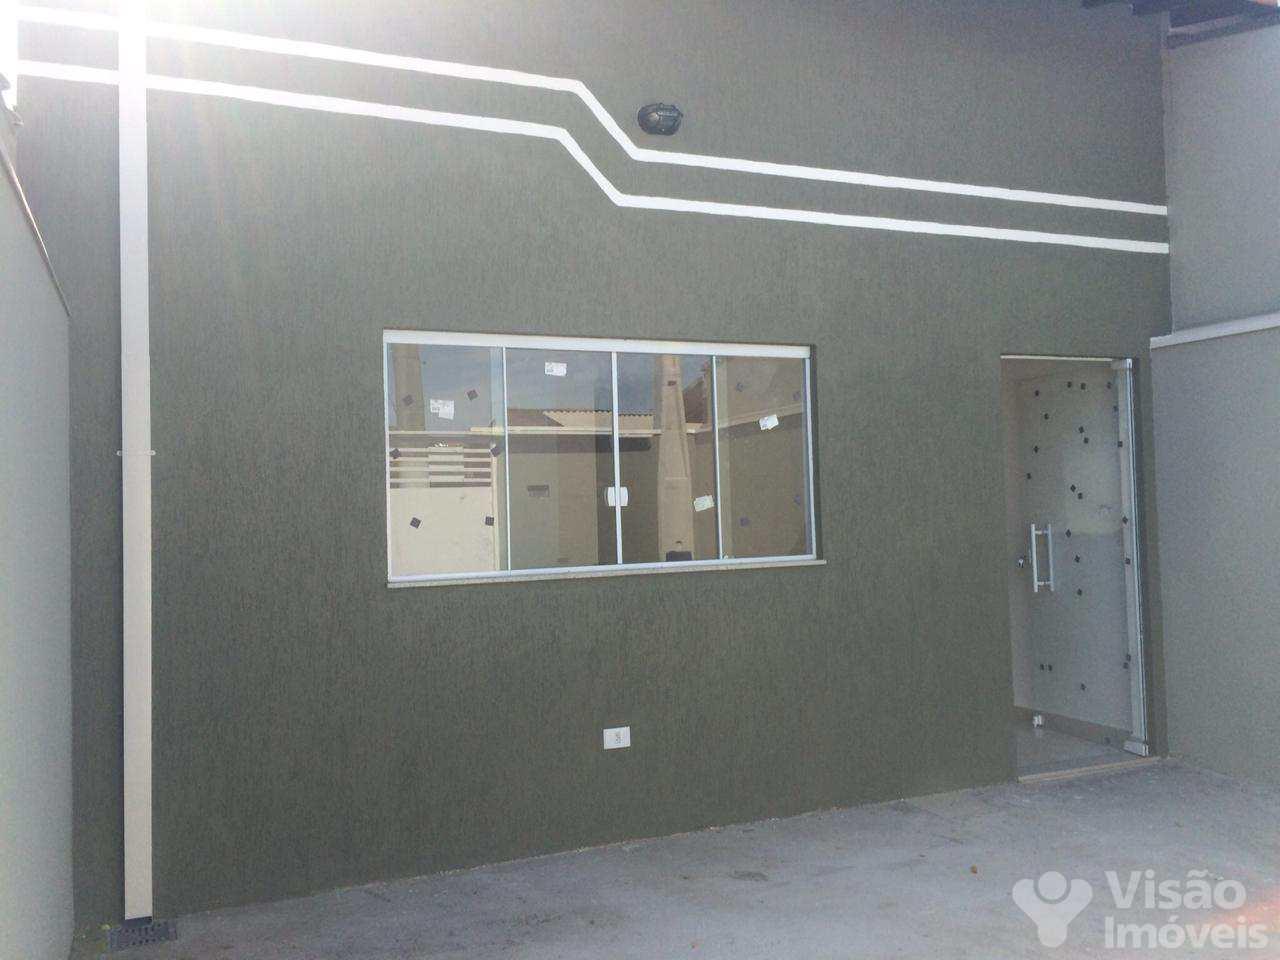 Casa com 2 dorms, Mantiqueira, Pindamonhangaba - R$ 189 mil, Cod: 1920040